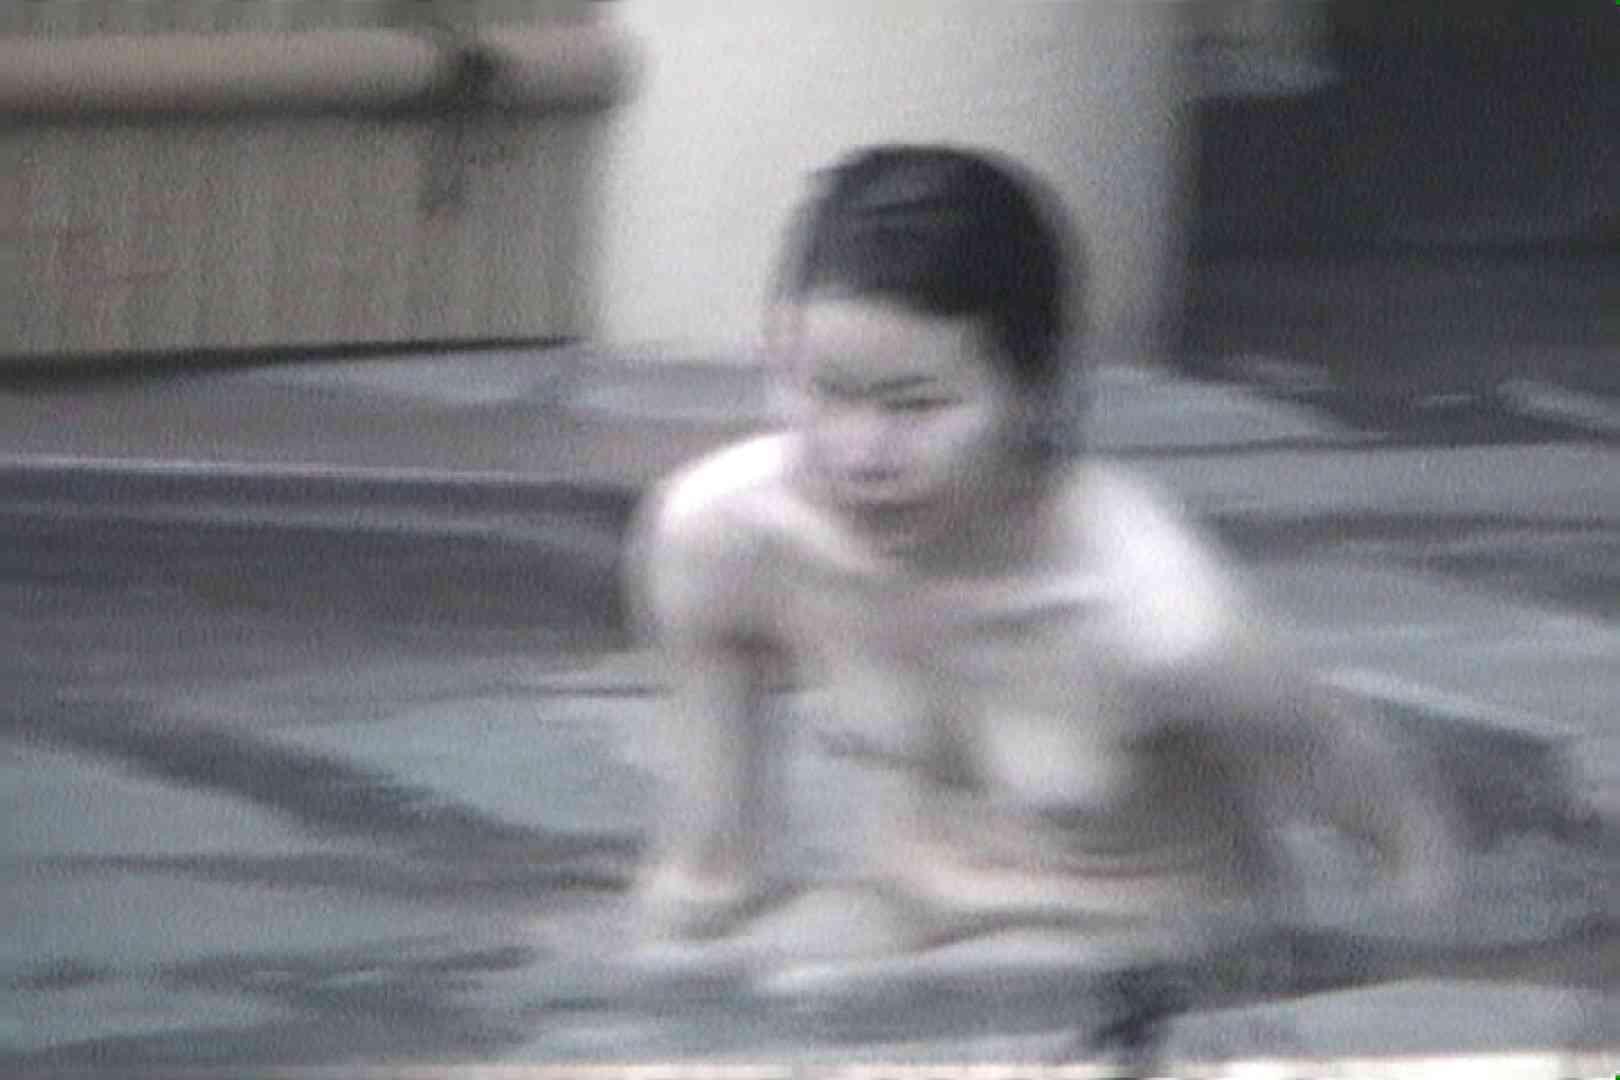 Aquaな露天風呂Vol.556 露天風呂編 | 盗撮シリーズ  99PIX 5